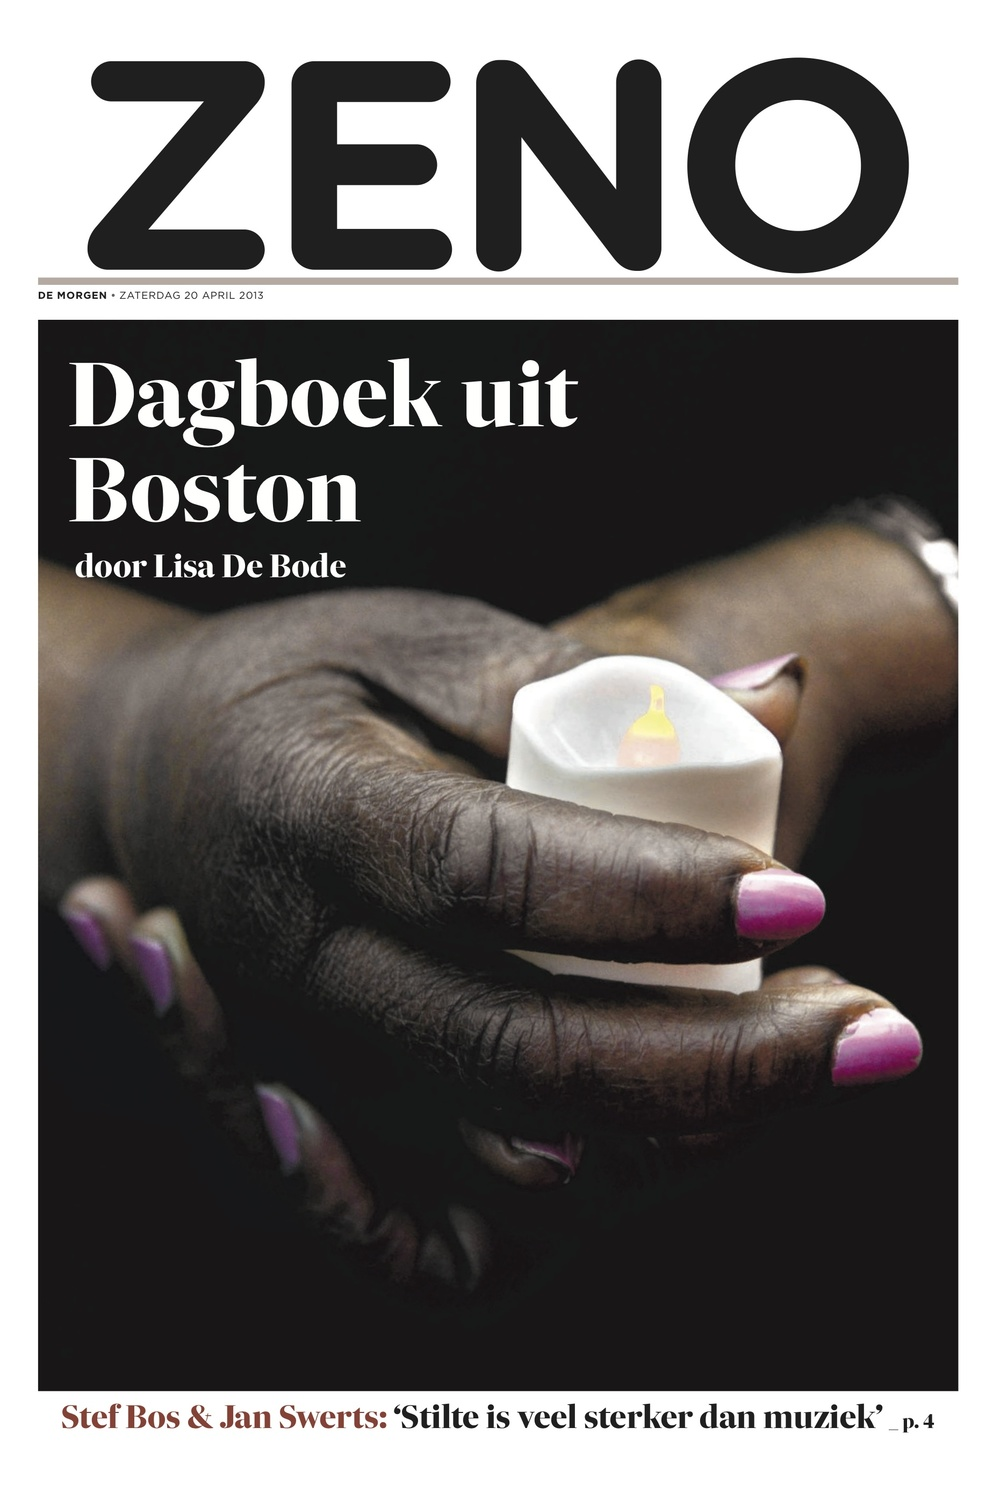 The Boston marathon bombing, Dagboek uit Boston